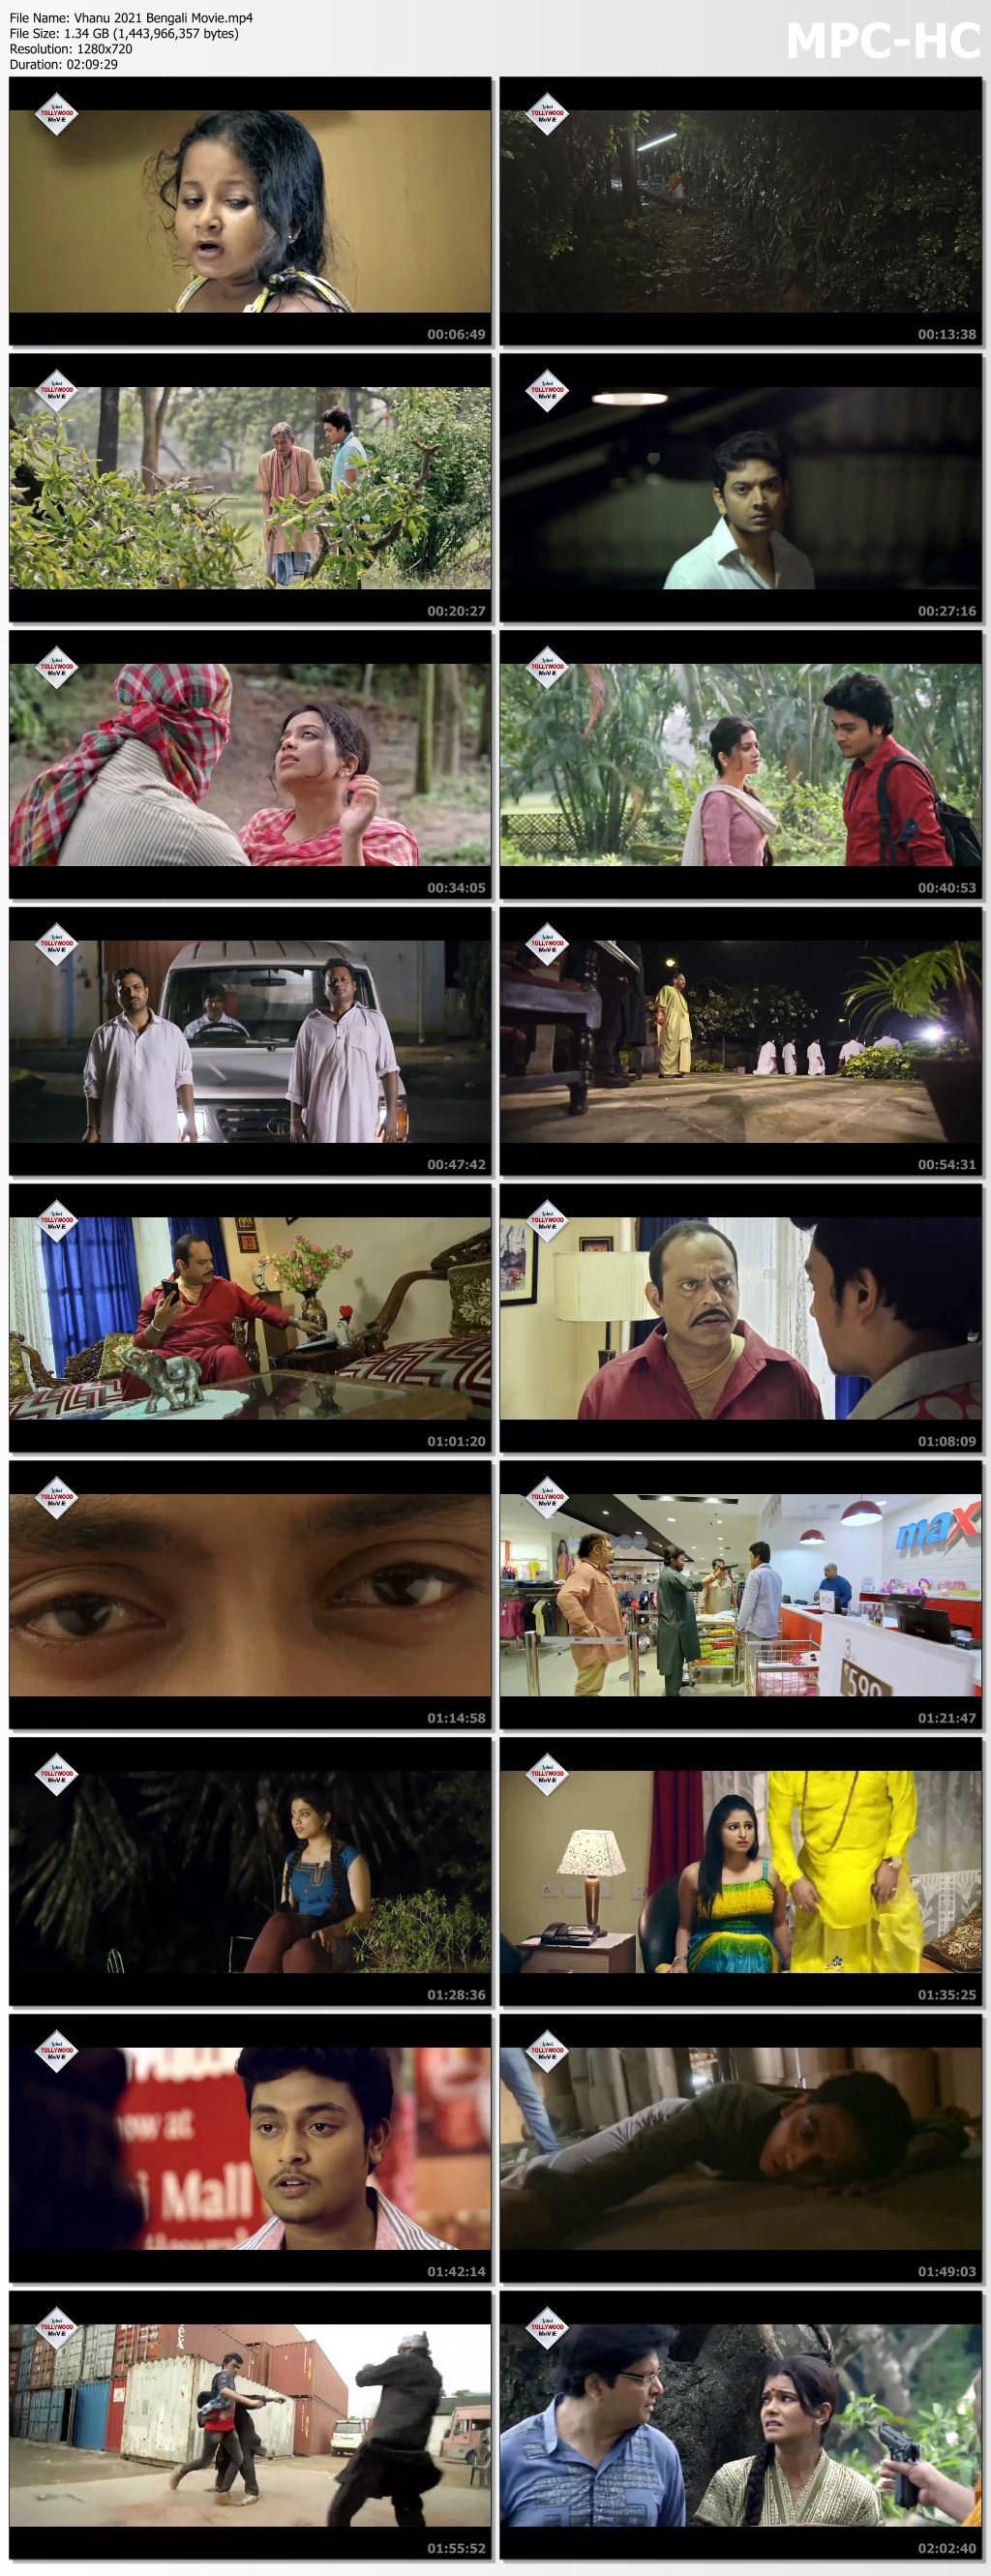 Vhanu 2021 Bengali Movie.mp4 thumbs